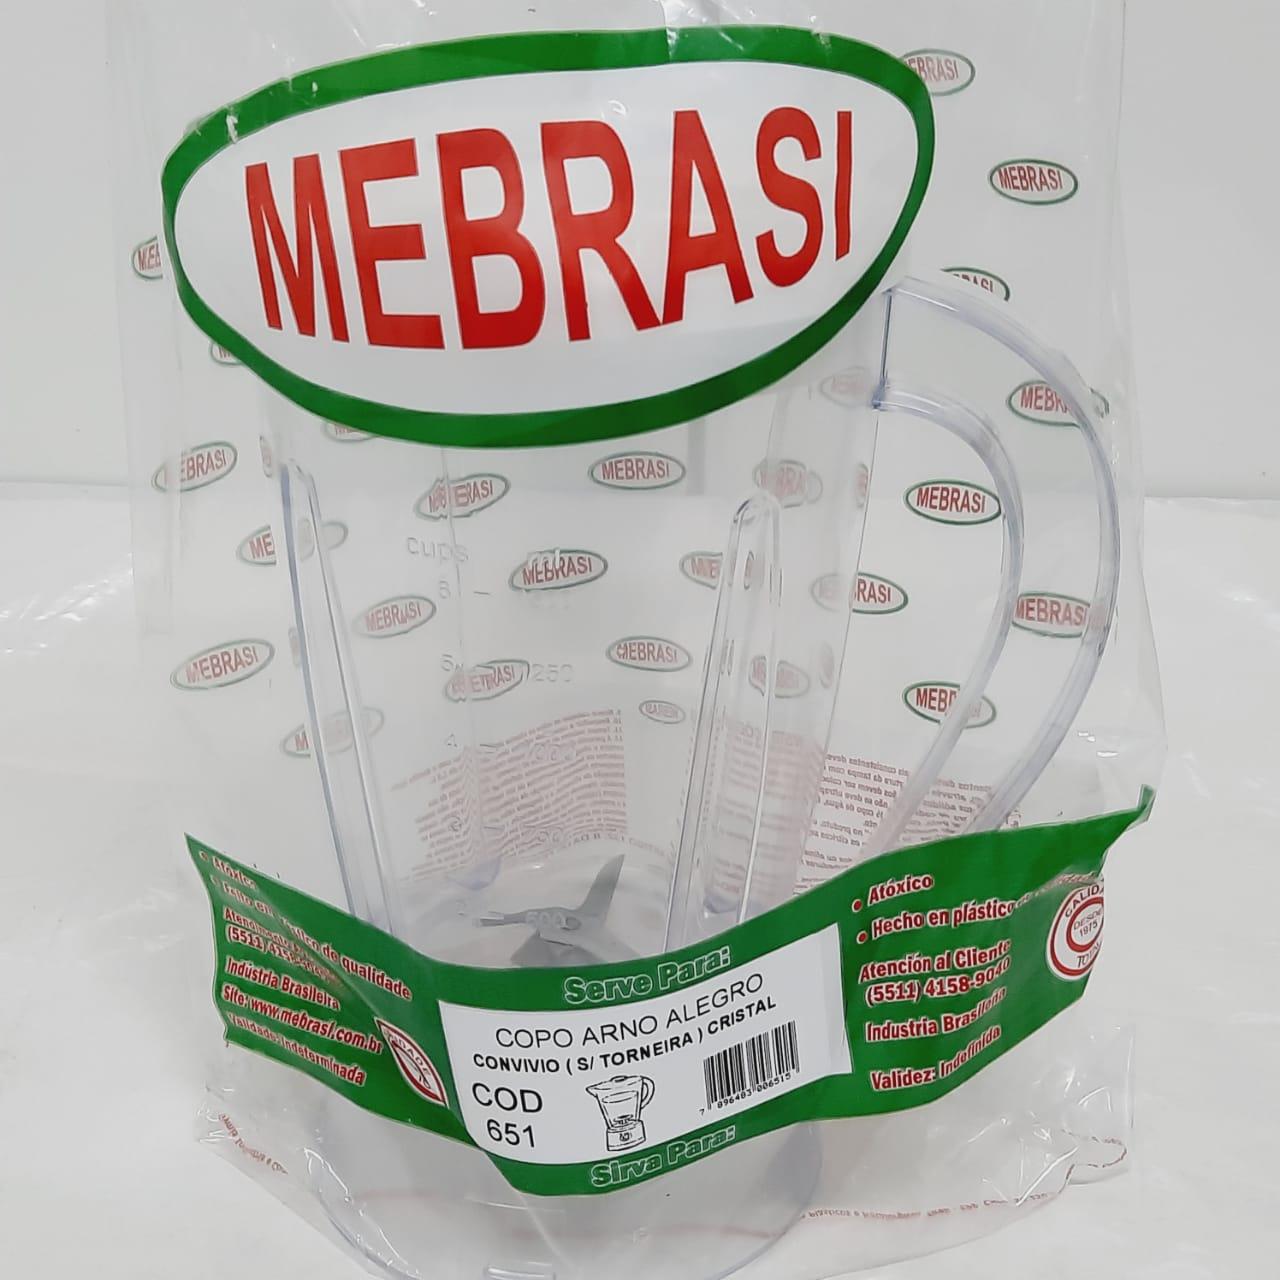 Copo Arno Cristal Alegro Clean - Mebrasi